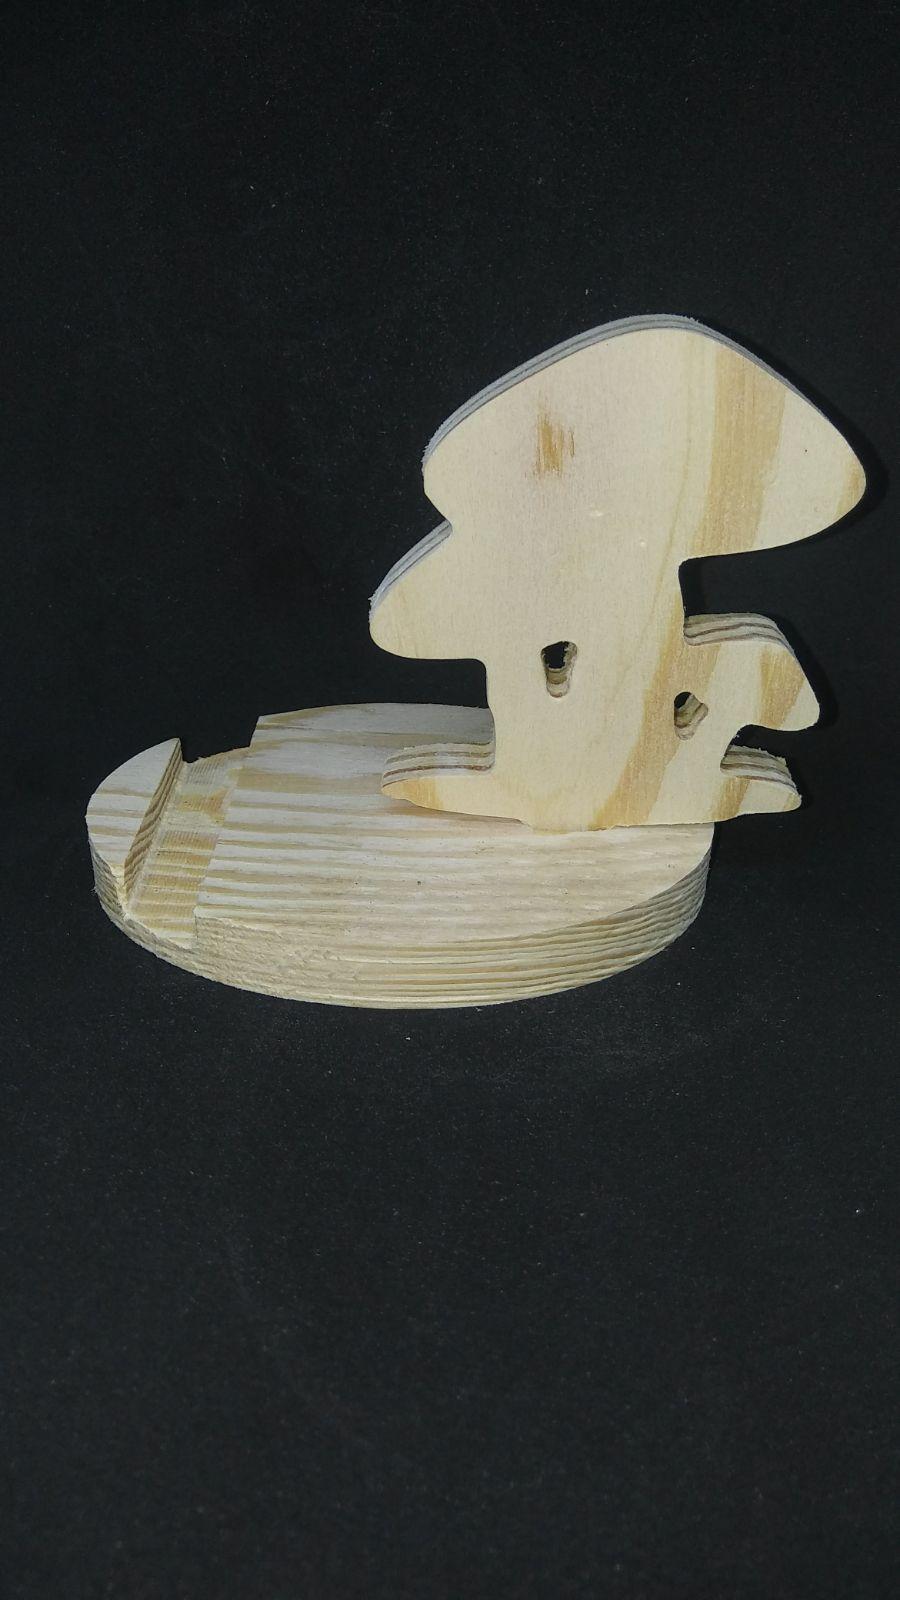 Wood Phone Stand - Mushrooms